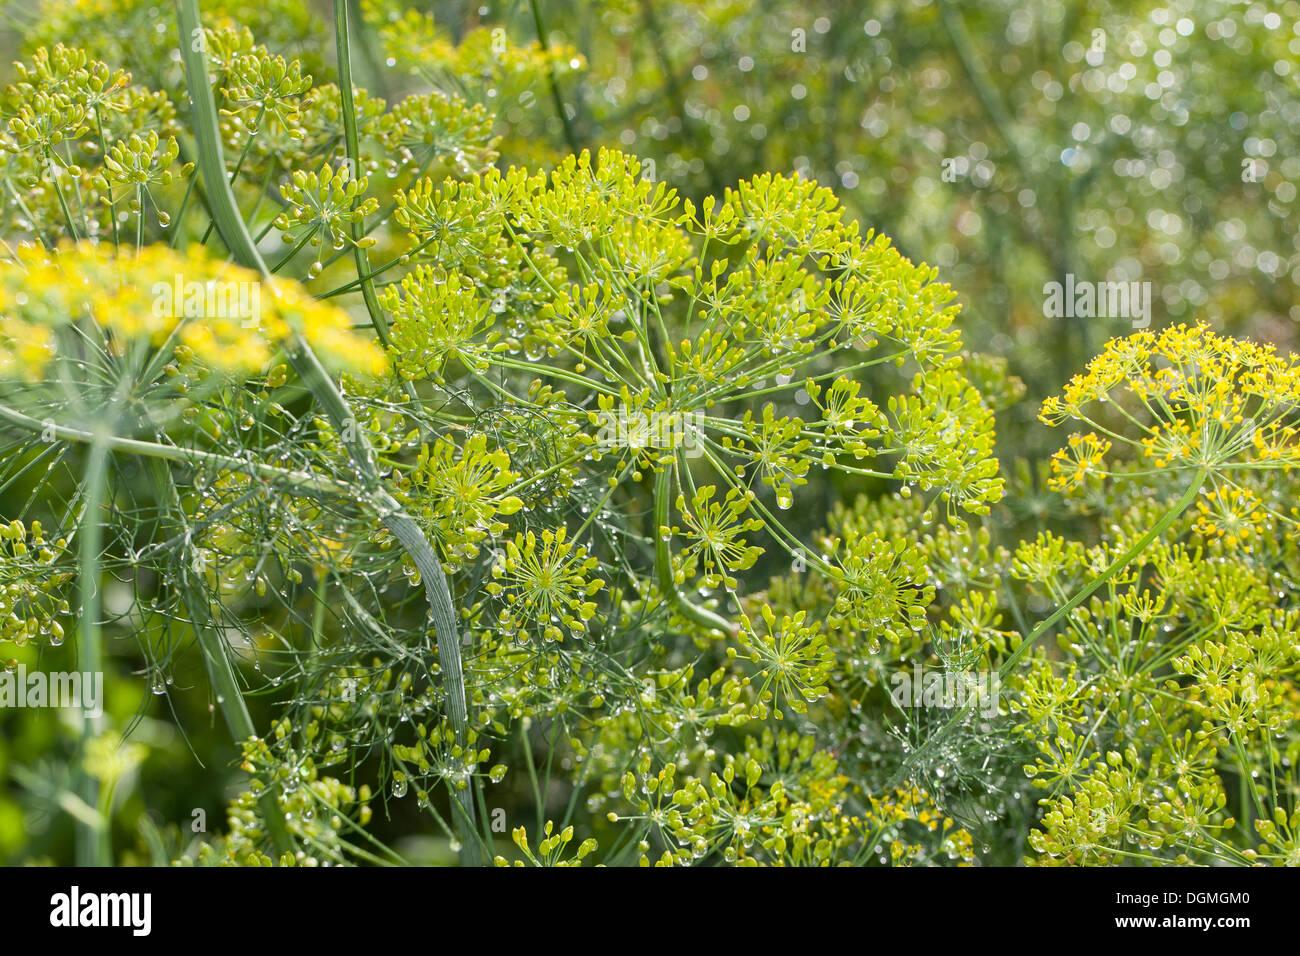 Aneth, Dill, Gurkenkraut, Anethum graveolens, spice, Gewürze, Gewürzpflanze Stock Photo